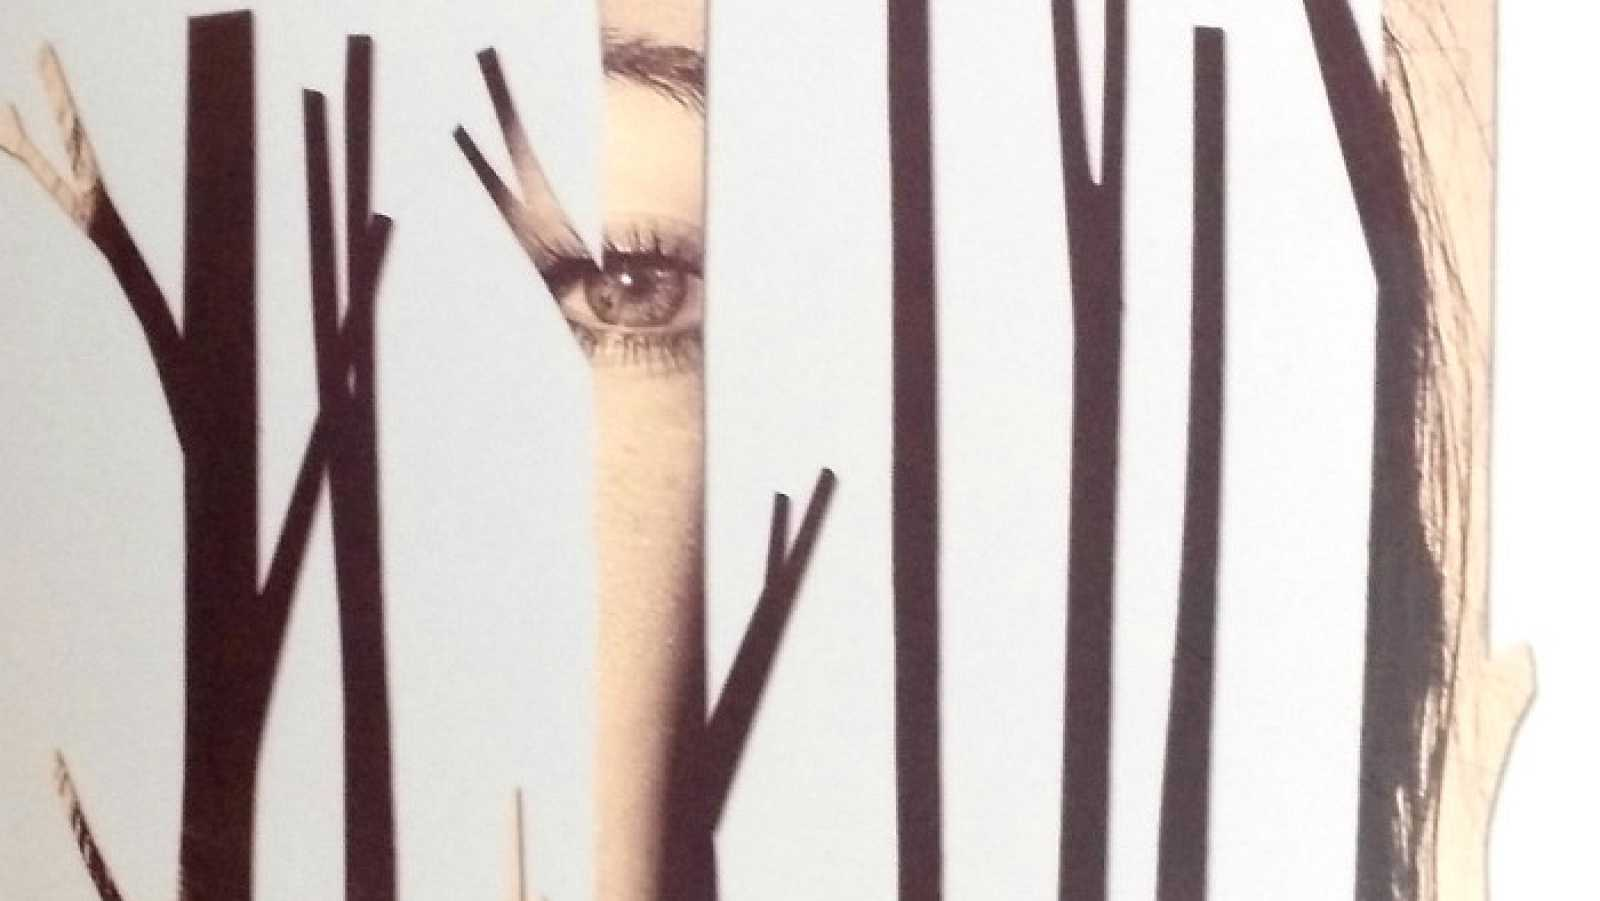 La buhardilla - Enfrentándonos a la ceguera - 16/05/17 - Escuchar ahora